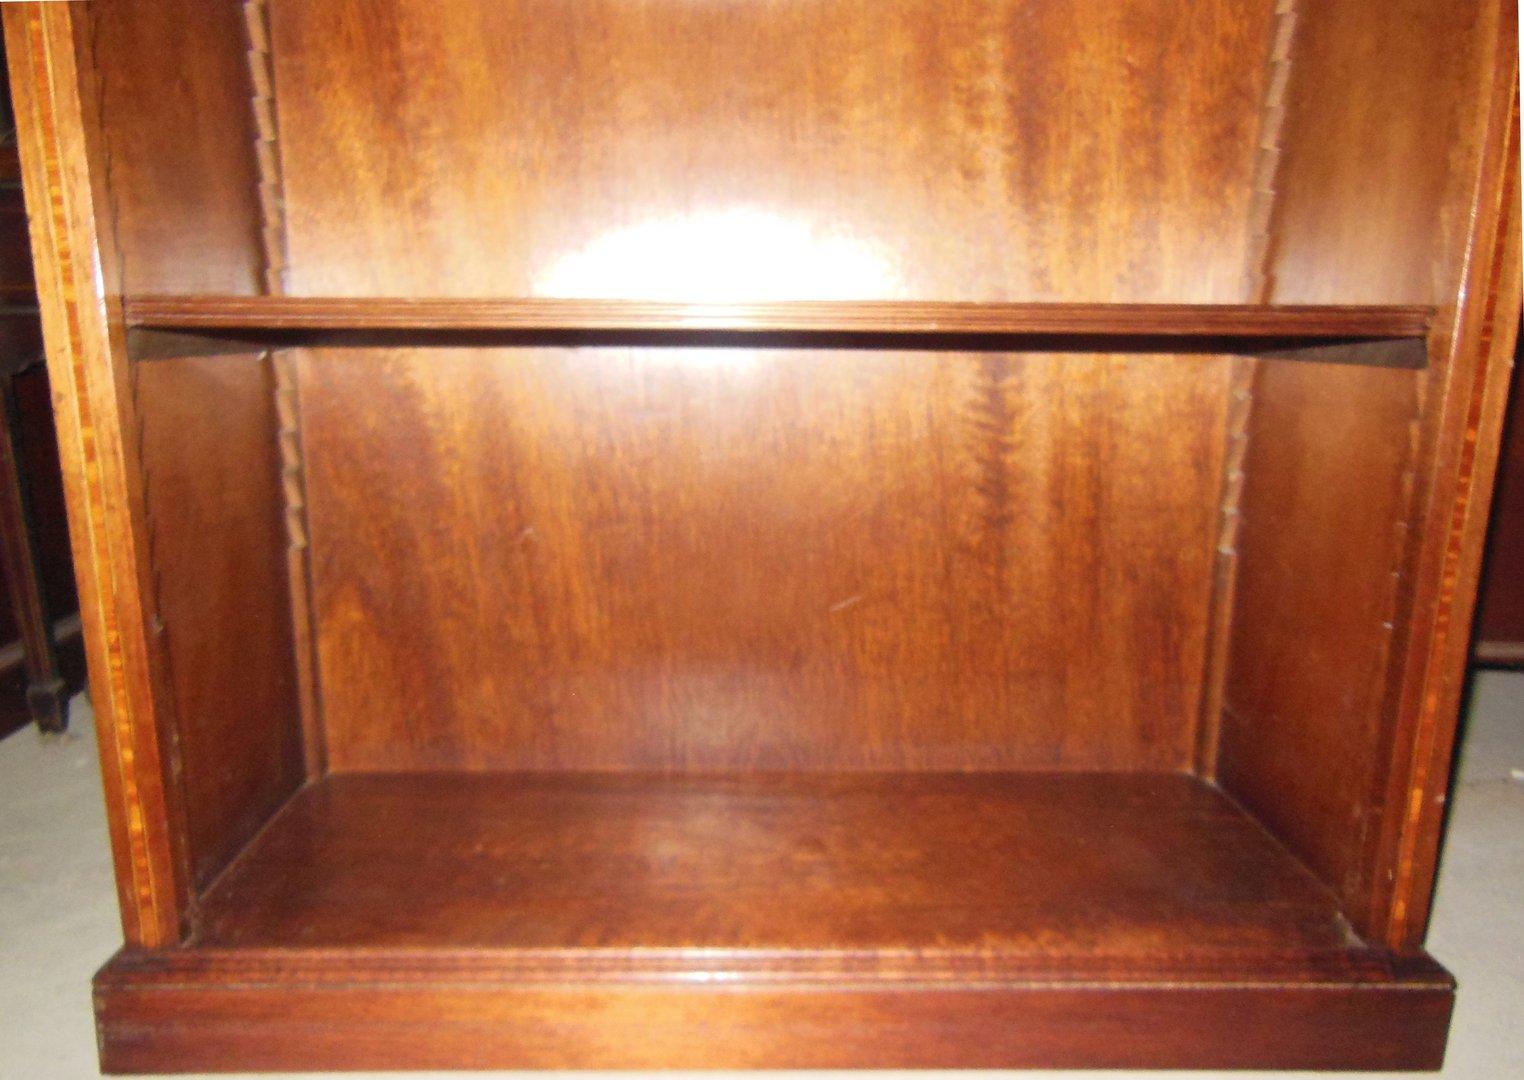 b cherregal aktenregal mahagoni furniertes regal englisches stil regal antik m bel. Black Bedroom Furniture Sets. Home Design Ideas